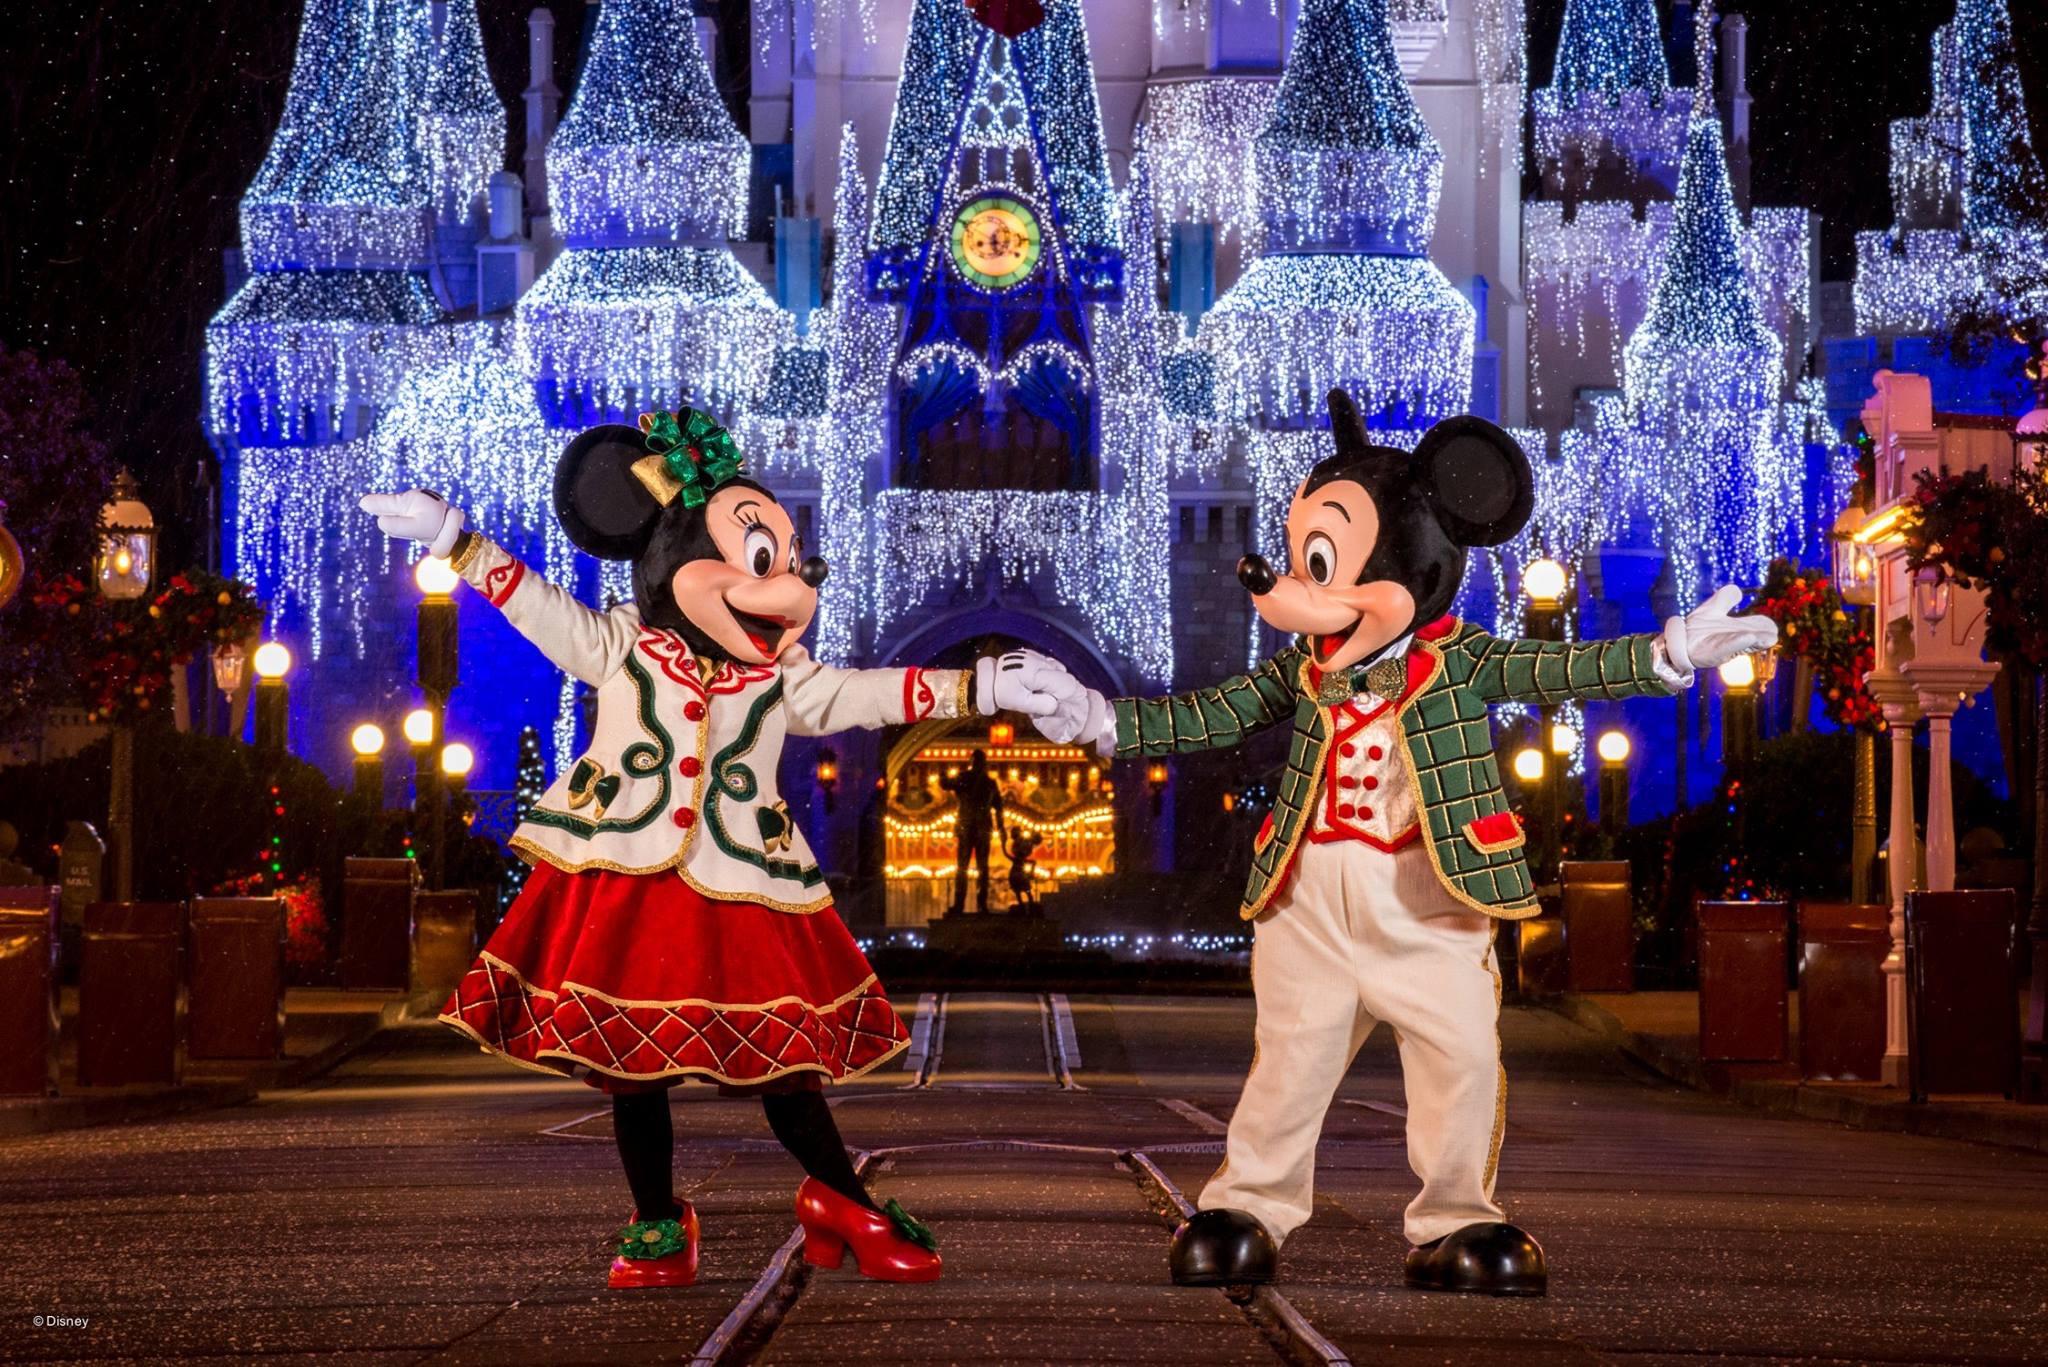 Mickeys Very Merry Christmas Party 2019.Mickey S Very Merry Christmas Party Tickets On Sale Now